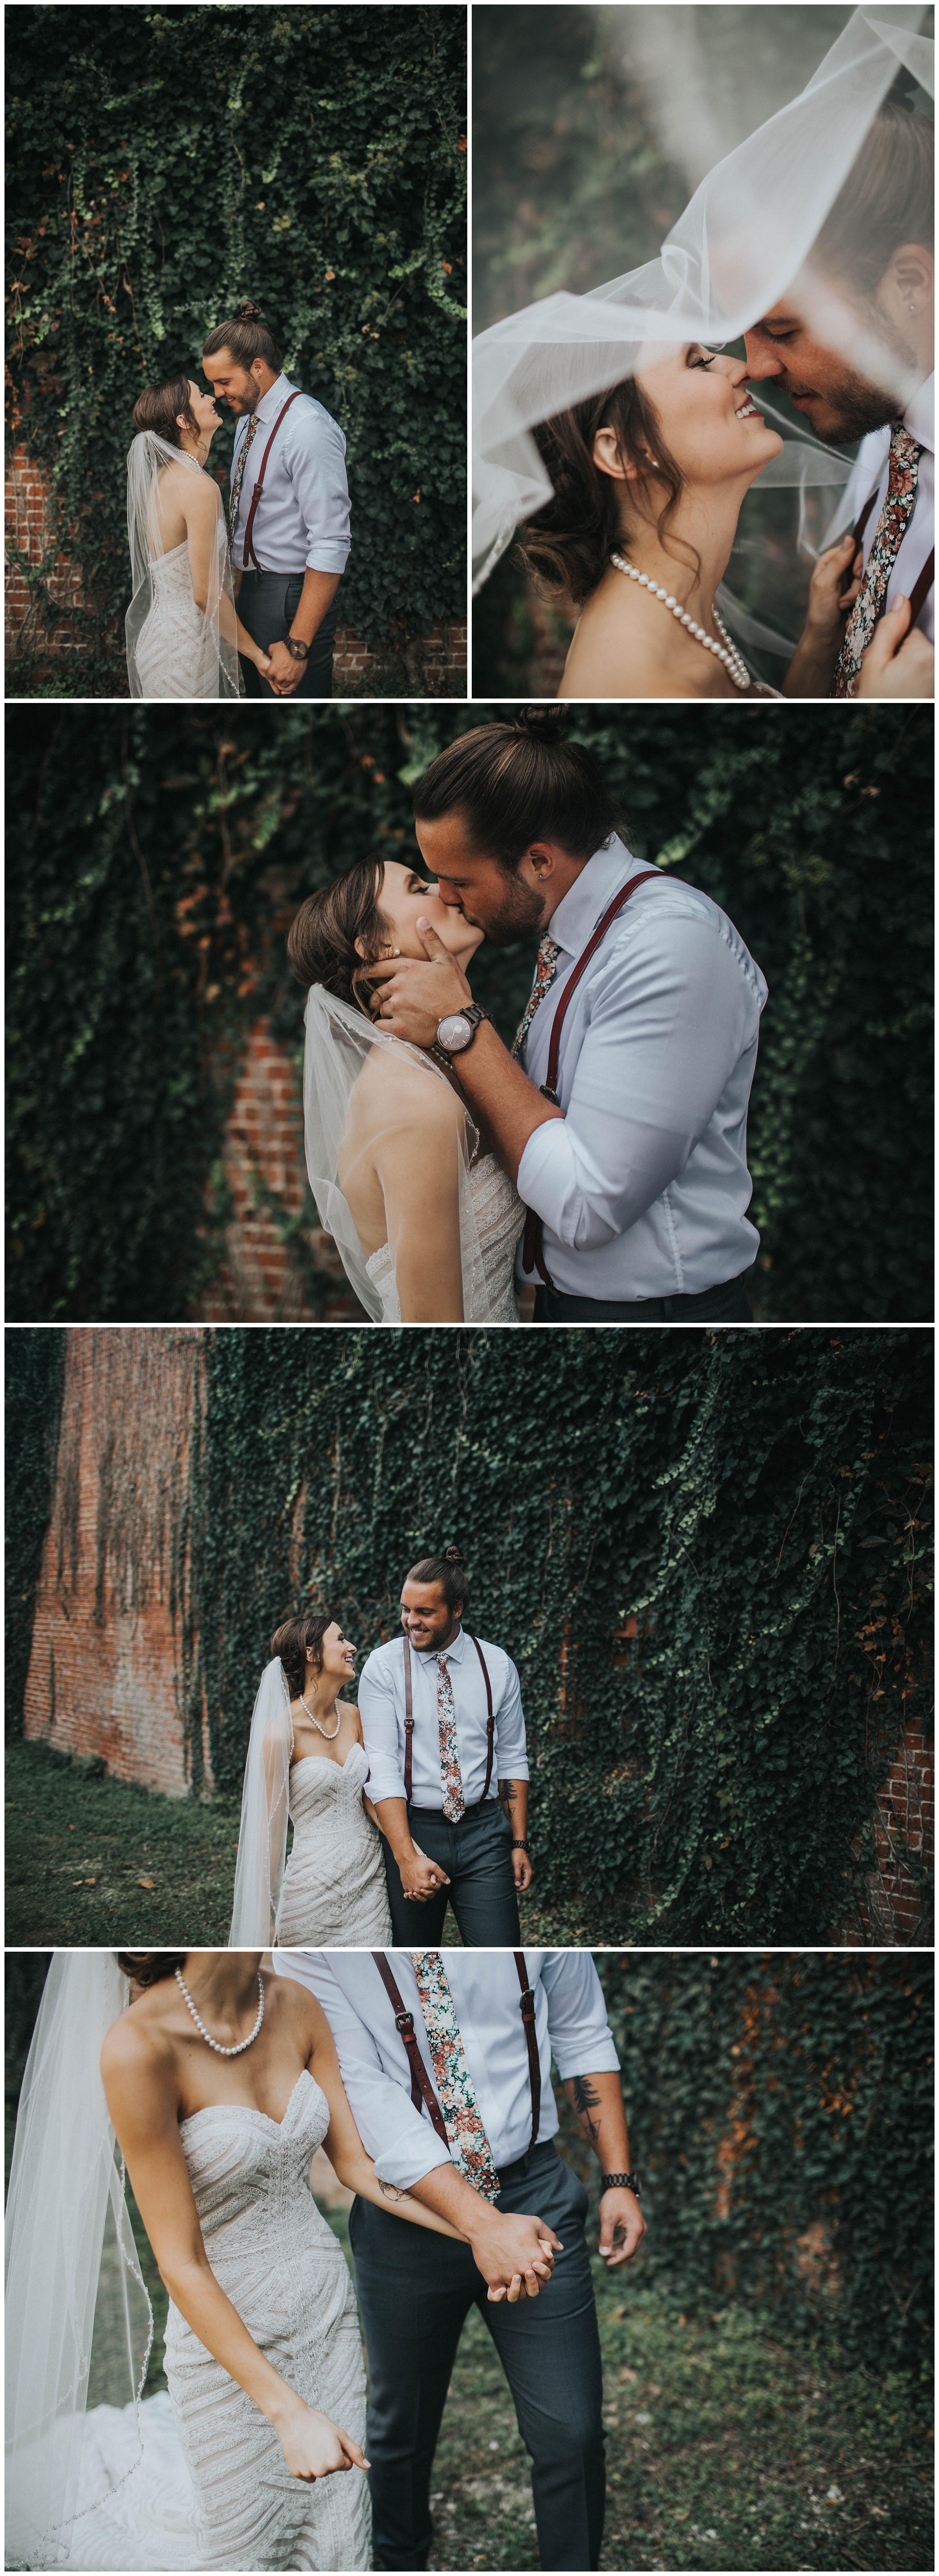 ravington, bride, groom, the, ravington, centerson, northwest, arkansas, johnsons, photo, wedding, photography